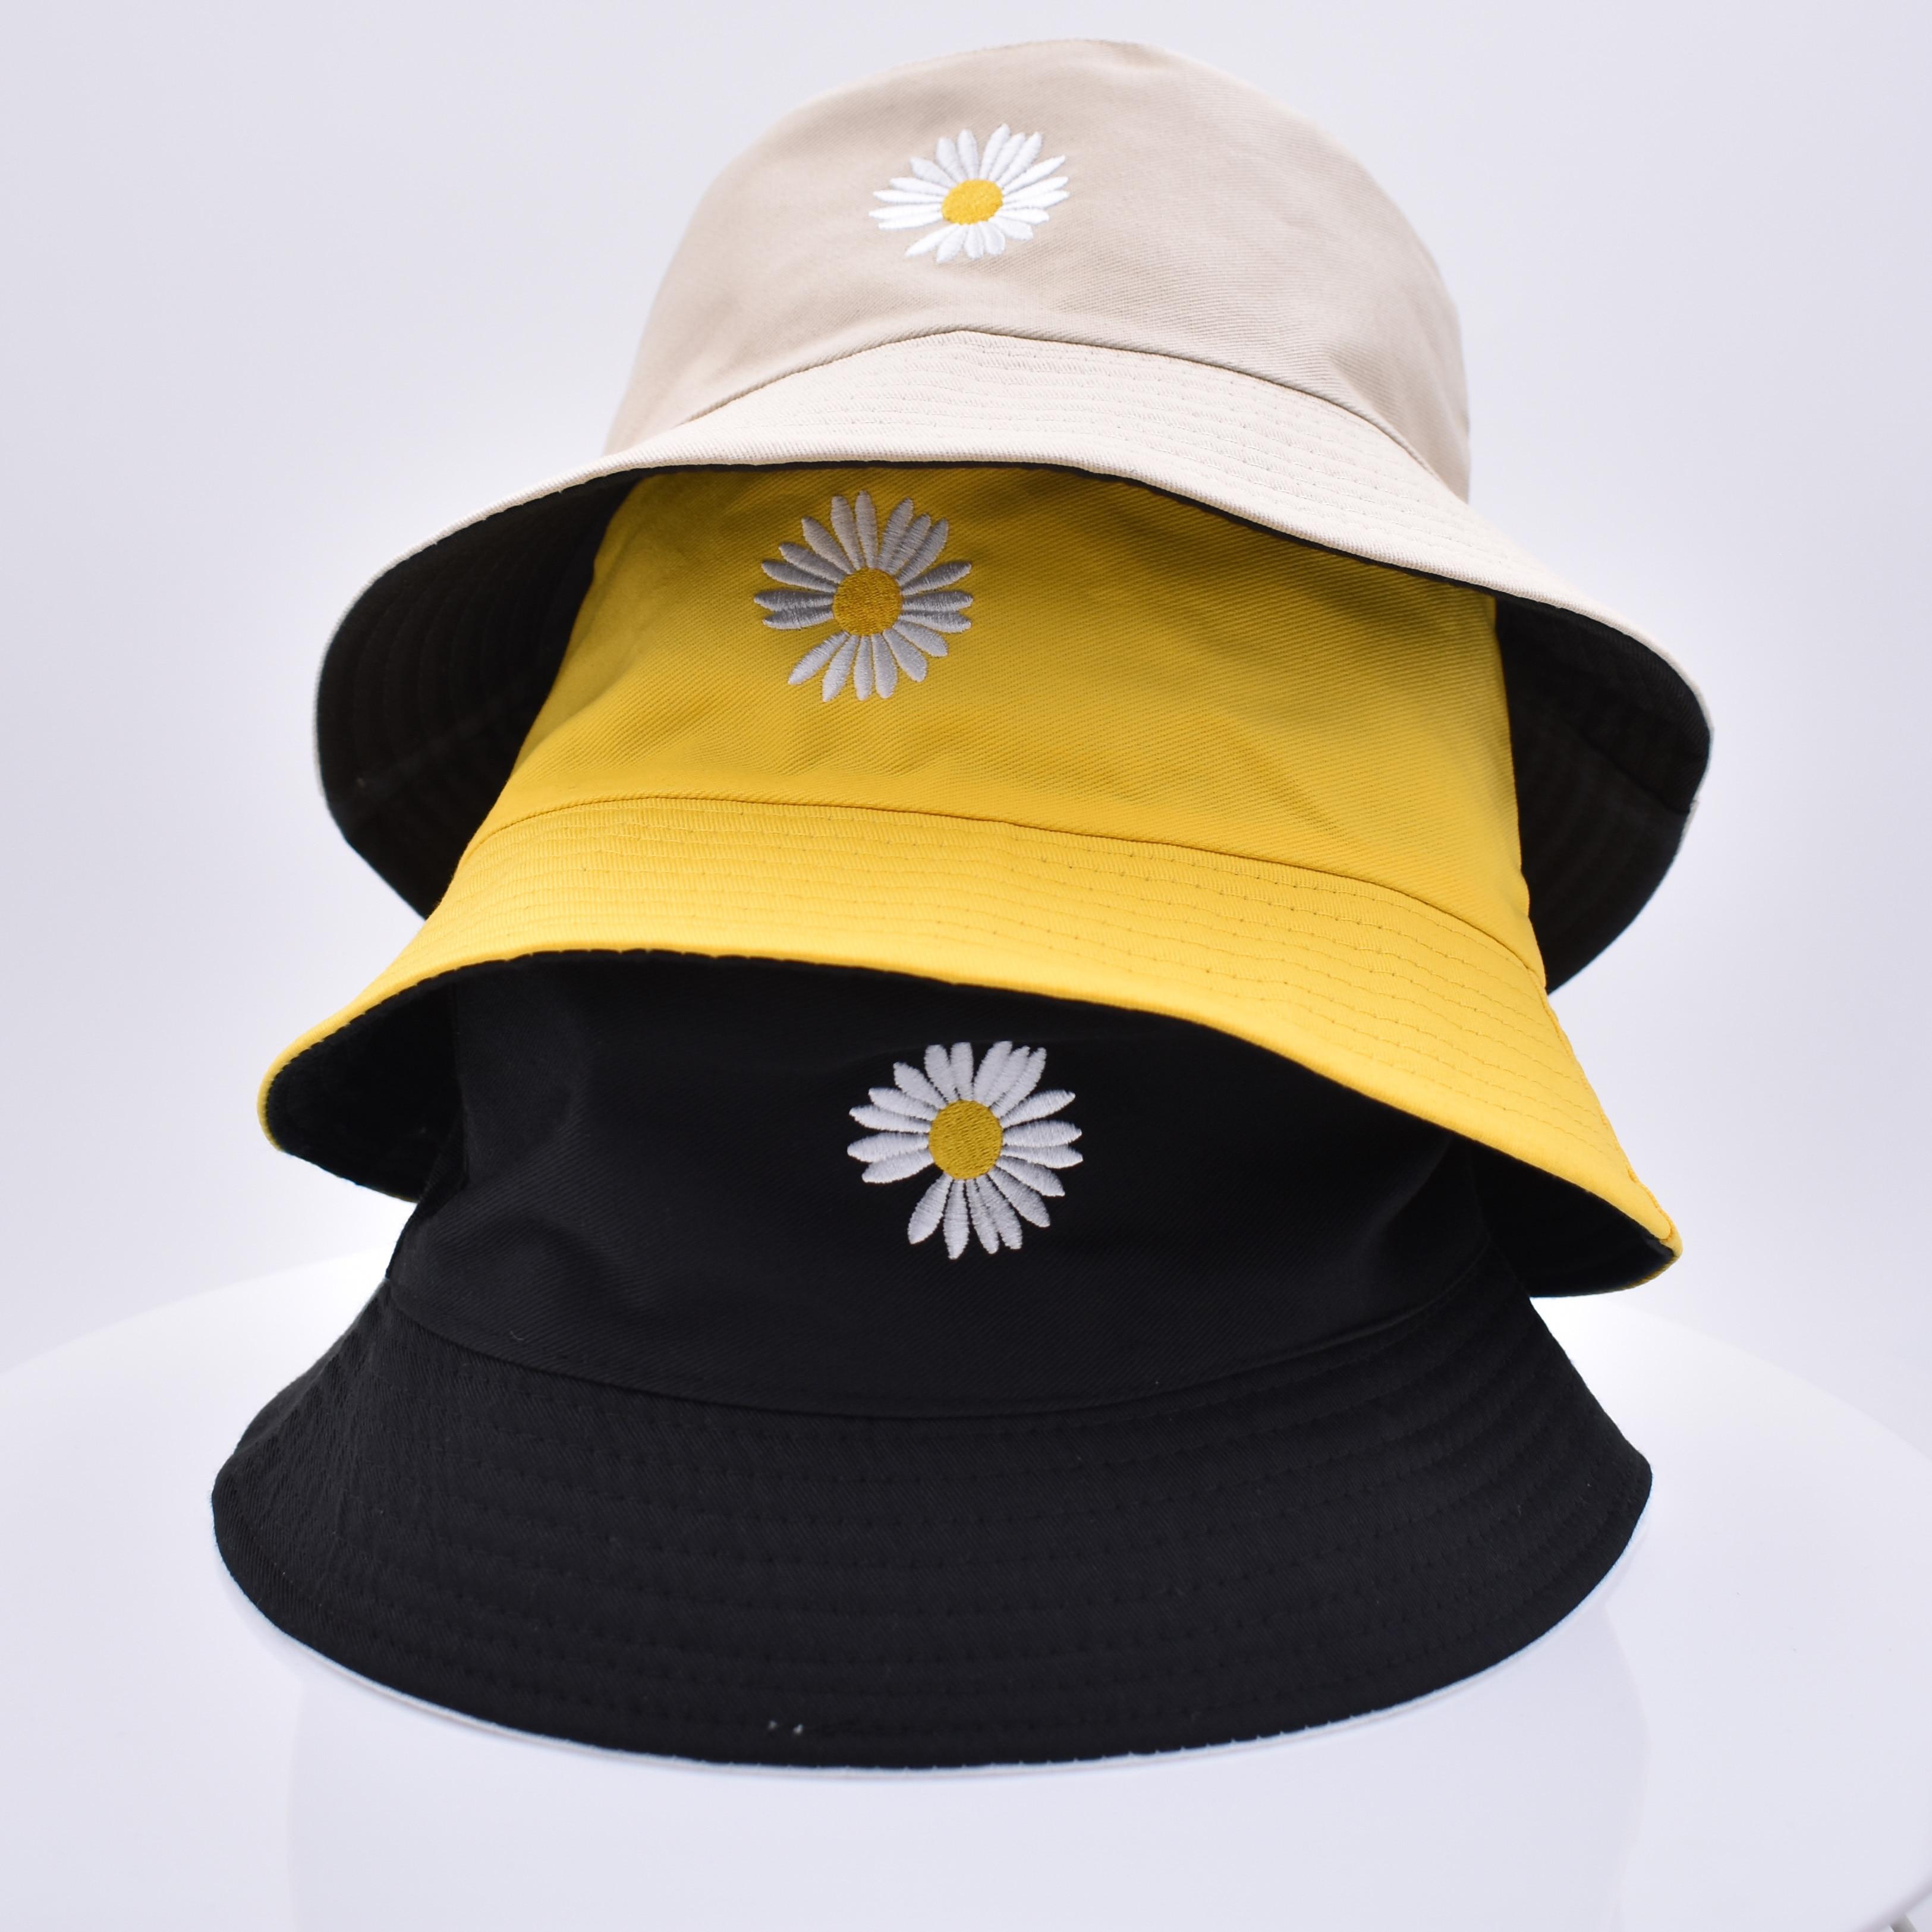 Summer  Daisies Bucket Hat Women Men Cotton  Fashion Sad Boy Cap Girls Double-Sided Daisy Bob Sun Femme Floral Panama Hat